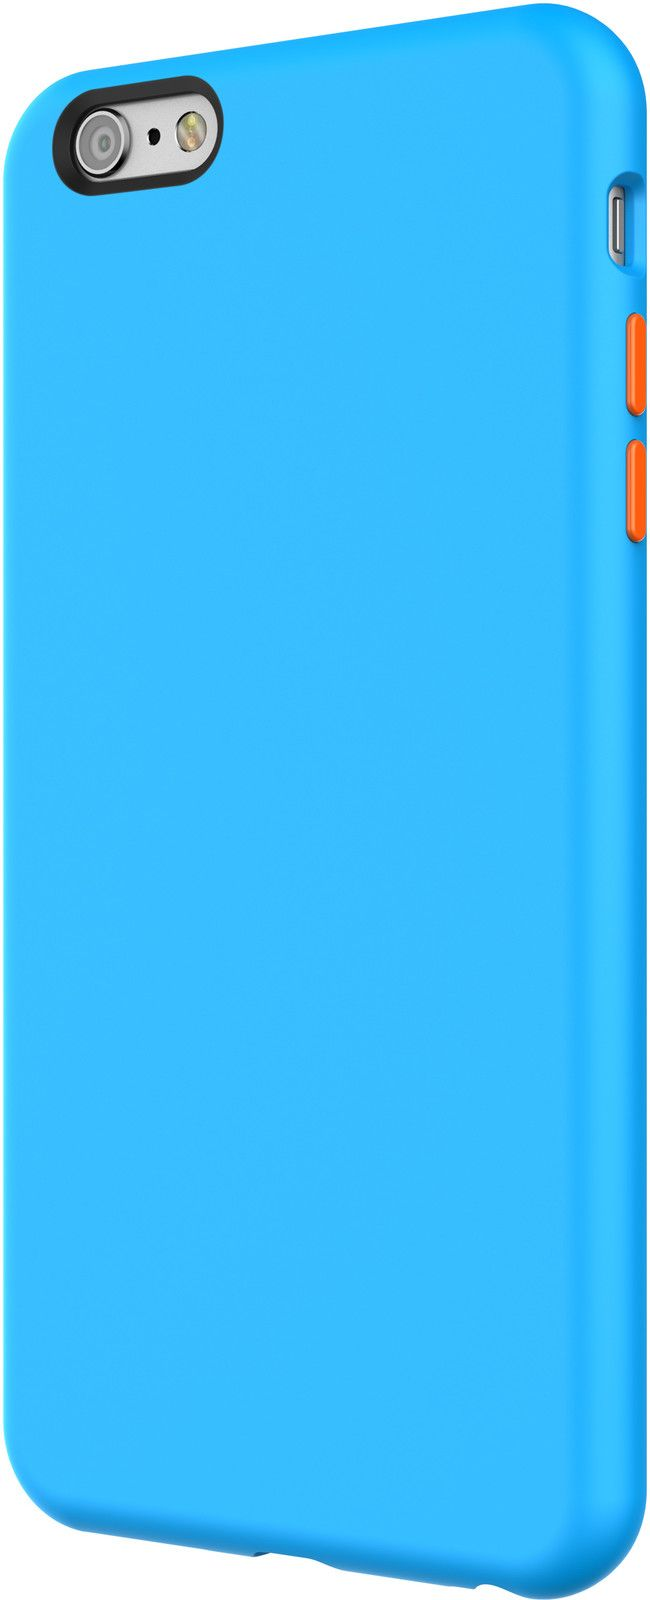 SwitchEasy Numbers (iPhone 6(S) Plus) – Svart